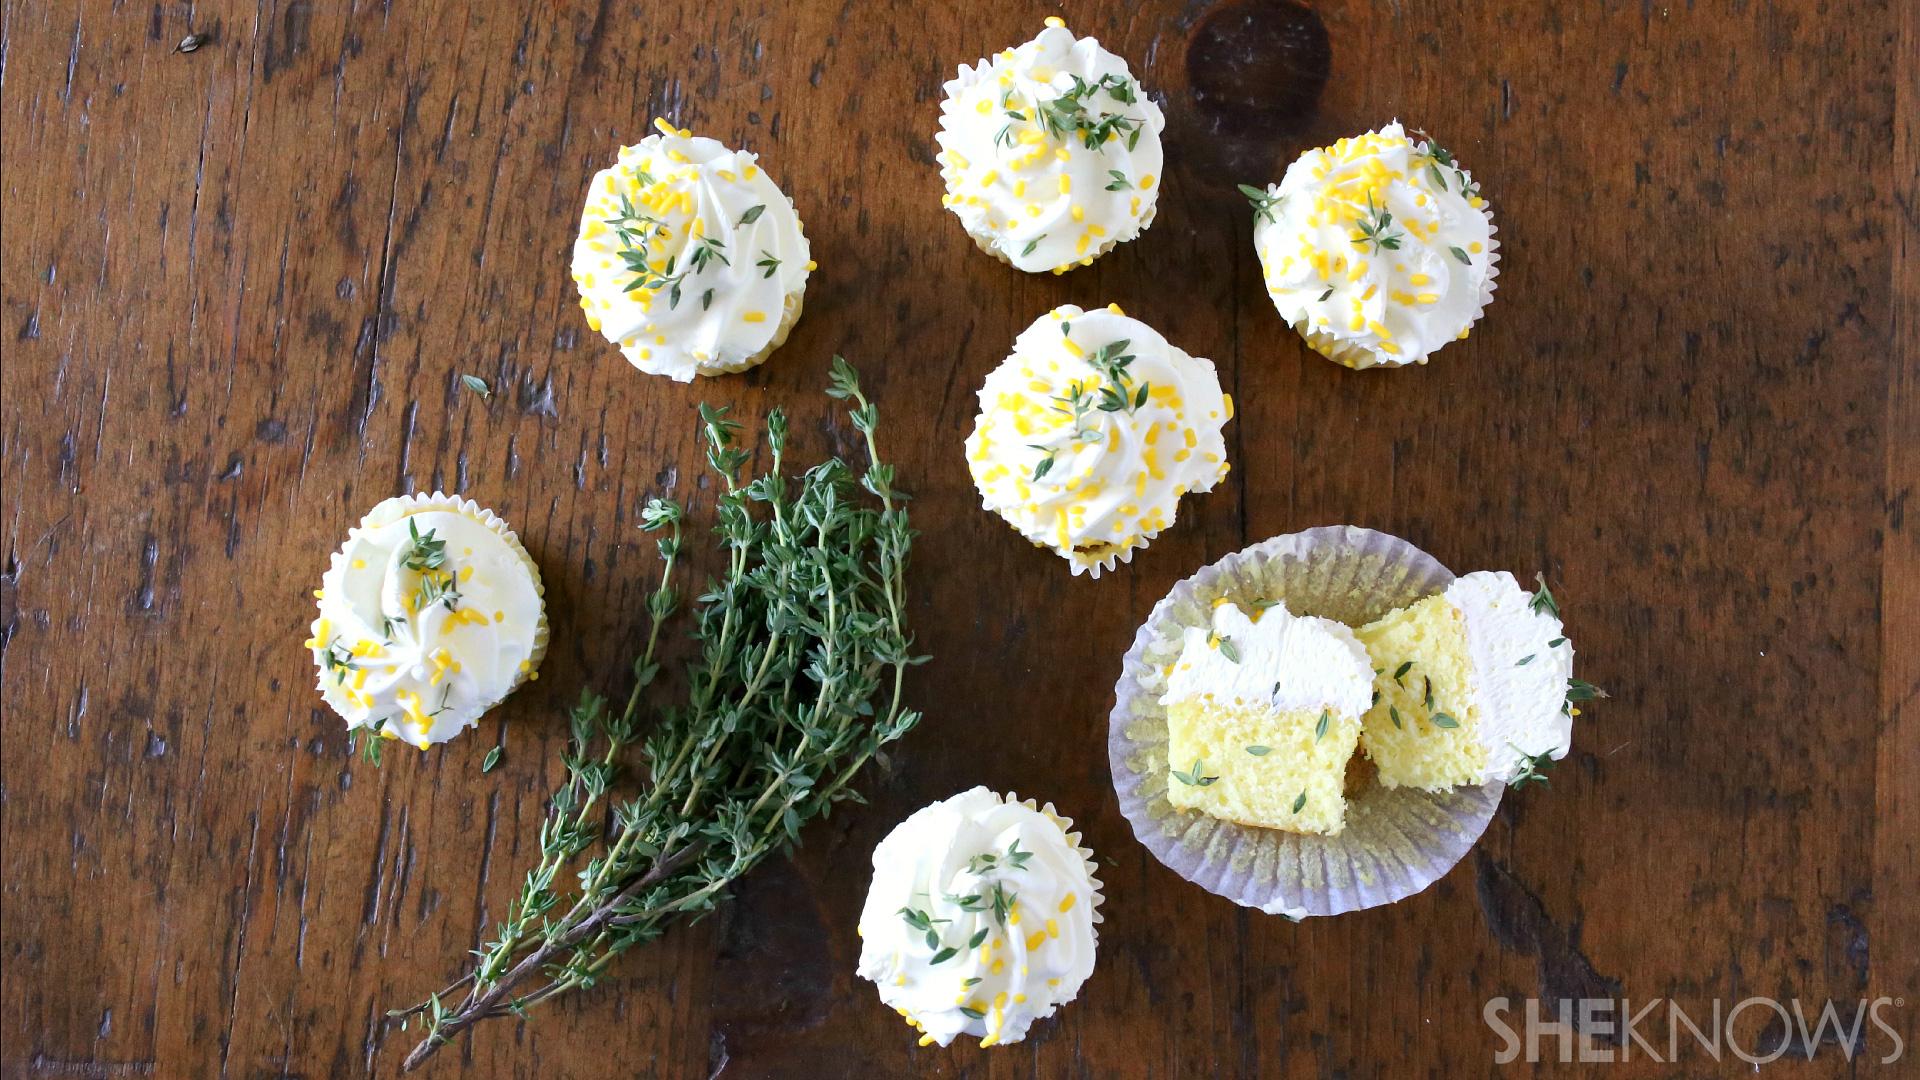 Lemon thyme olive oil cupcakes with lemon thyme buttercream